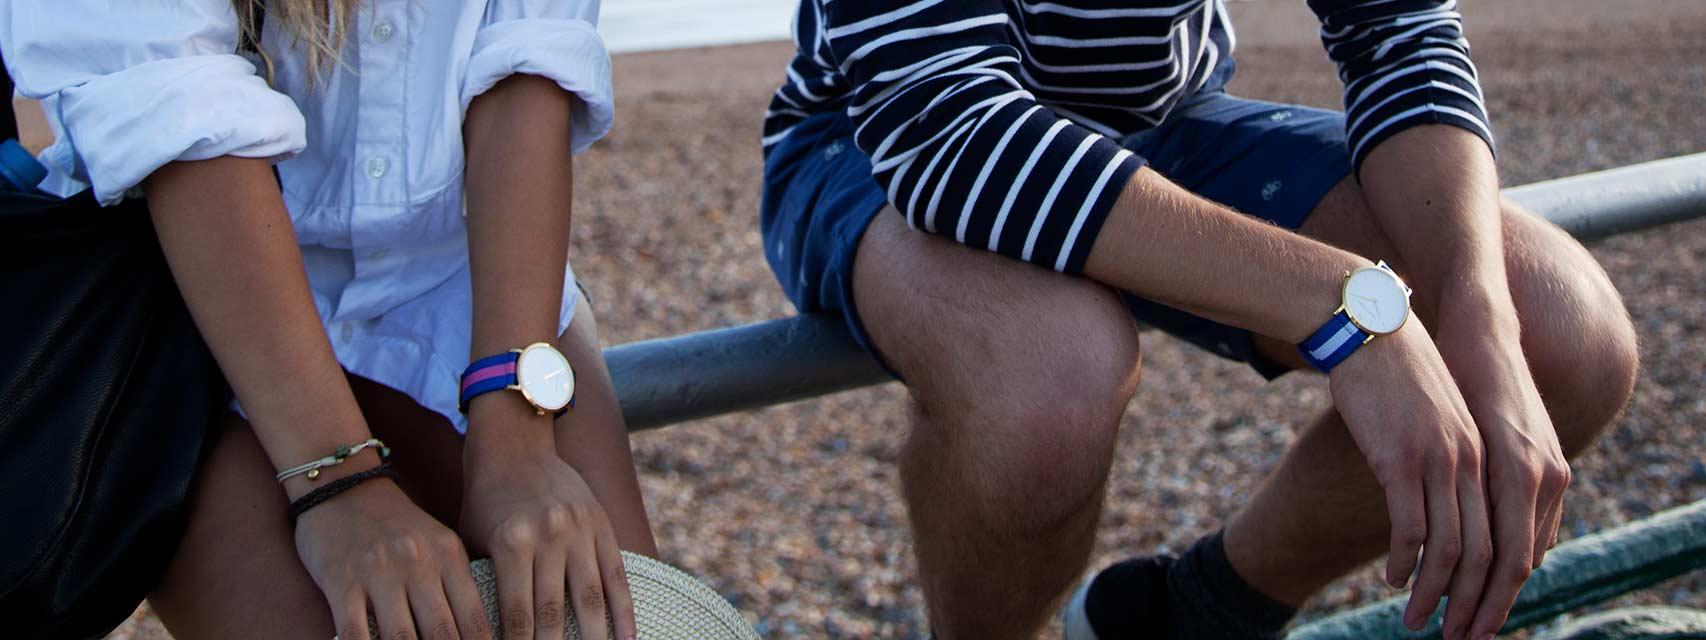 Contemporary watches fusing swedish minimalistic design & british heritage. an inspiration of sthlm & ldn